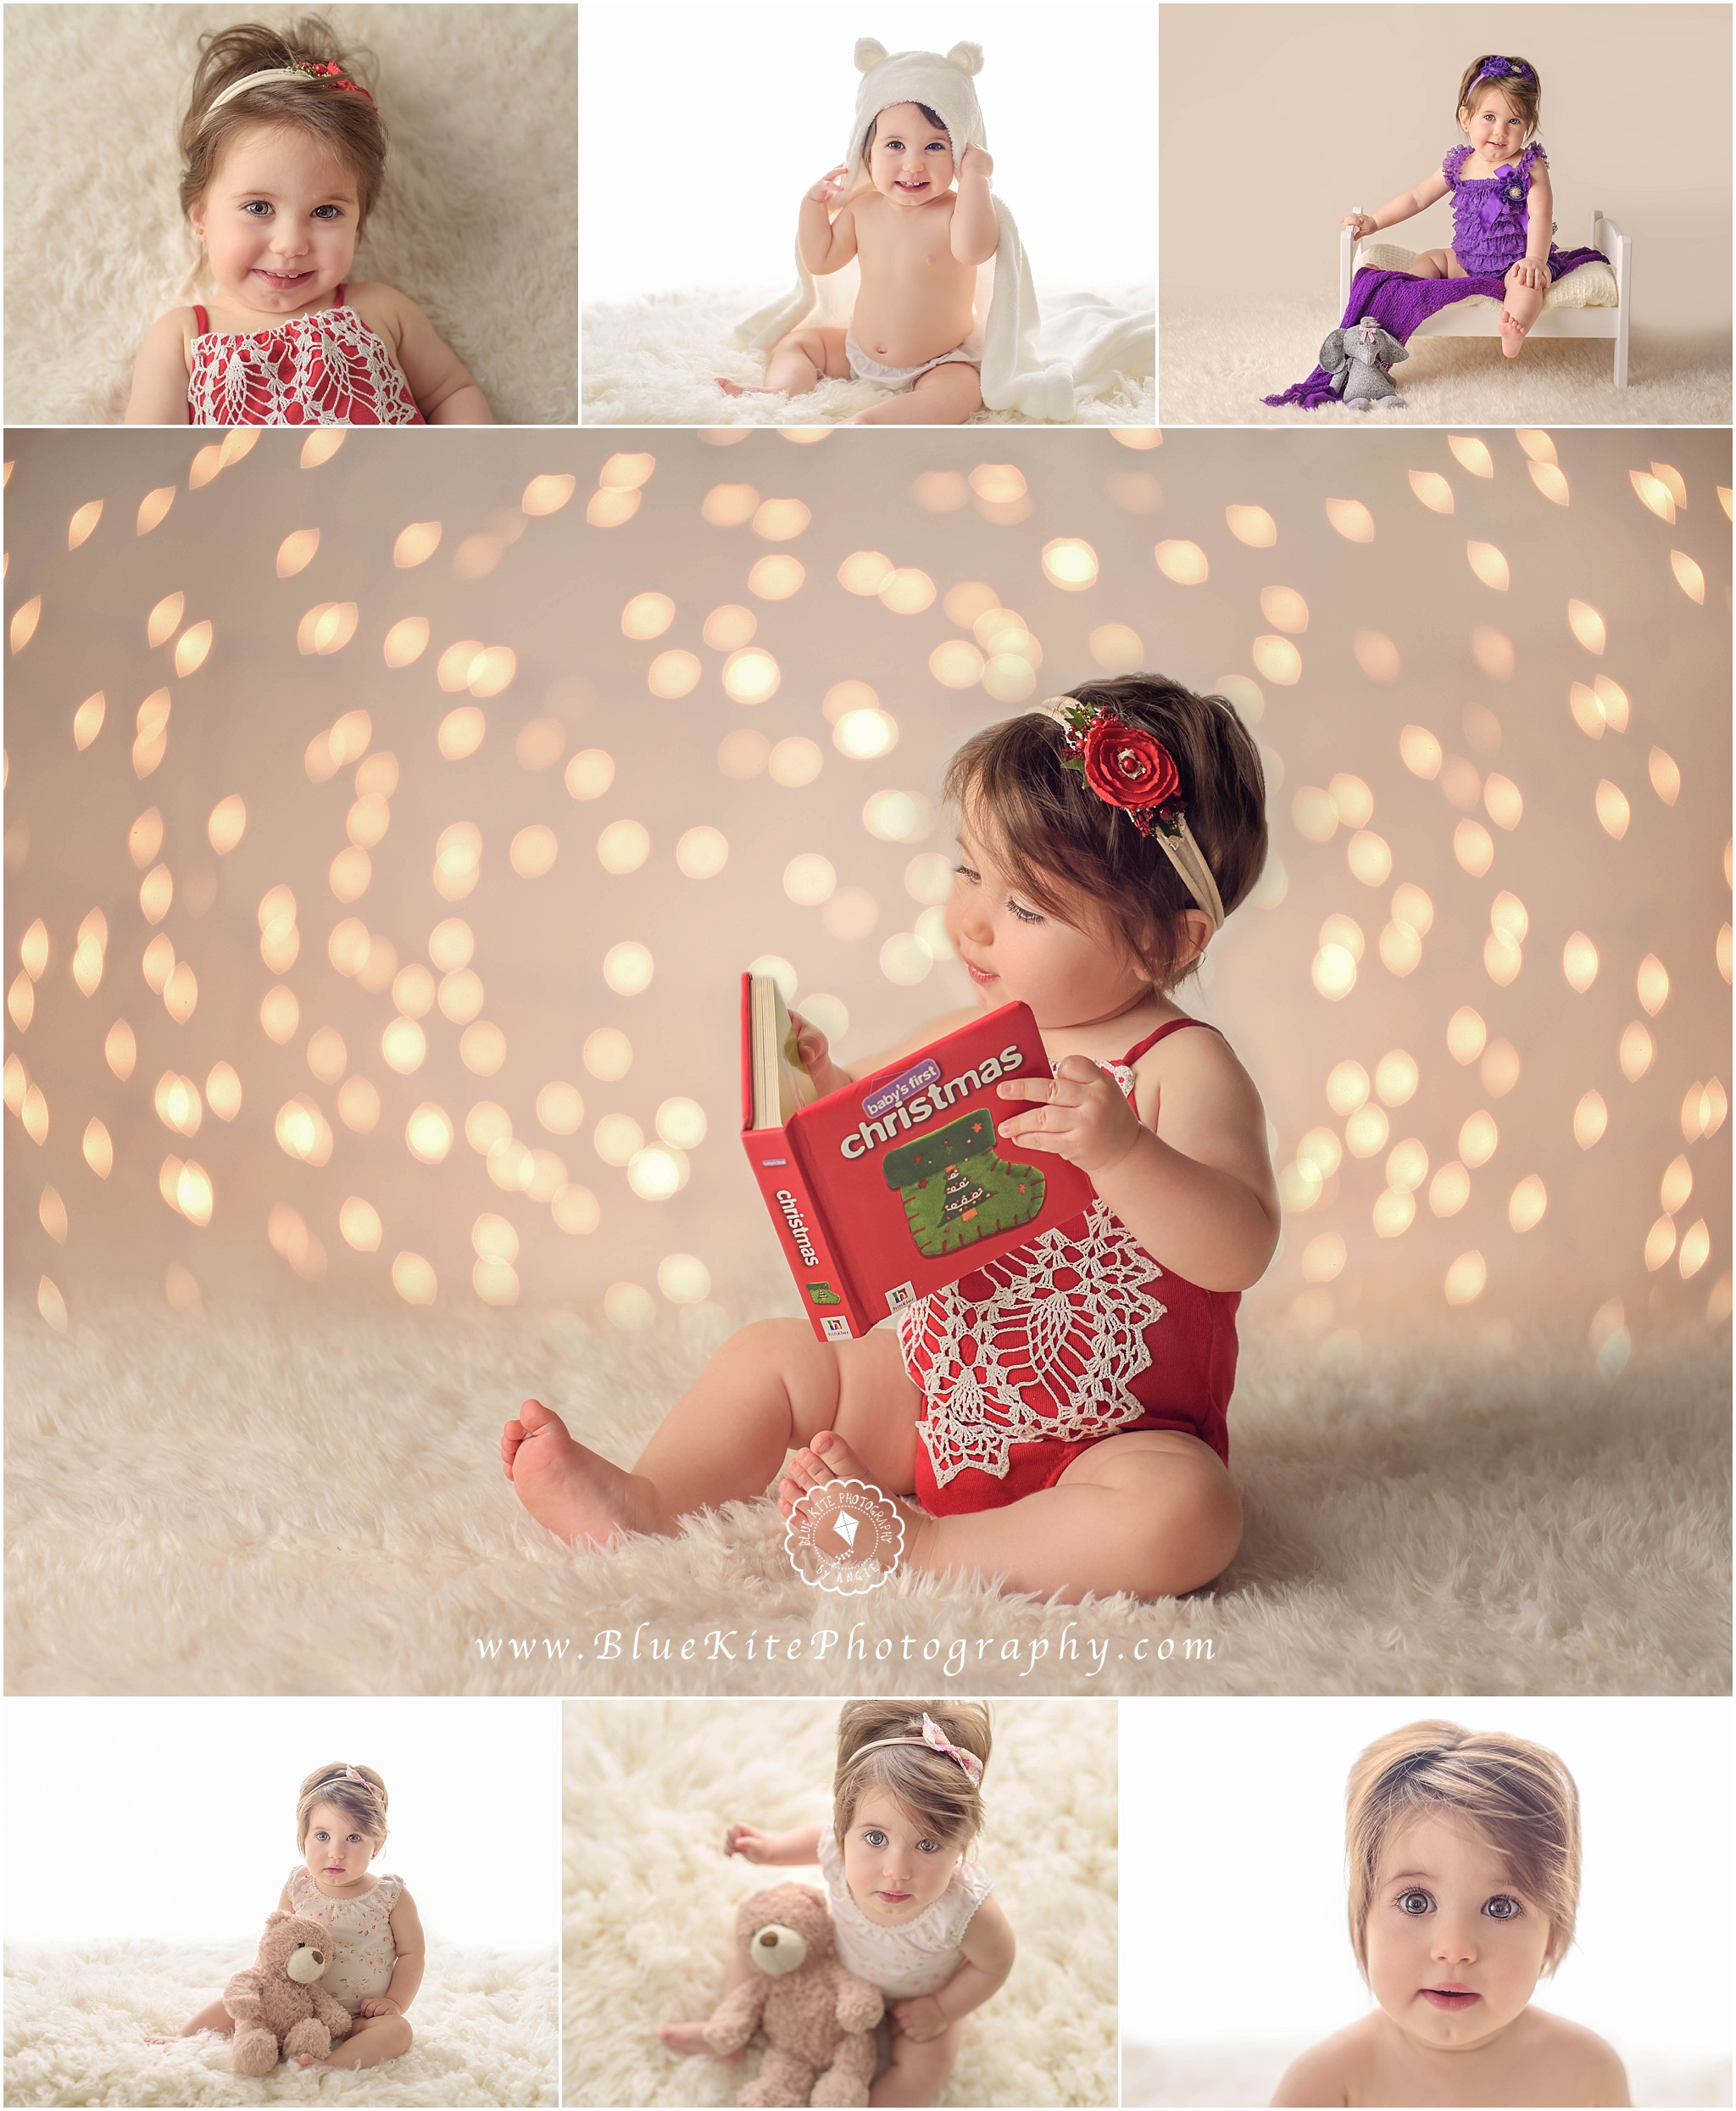 Baby photographer, baby session, baby photography in Boca Raton, Parkland, Coral Springs, Delray, Boynton, Deerfield, Wellington, South Florida